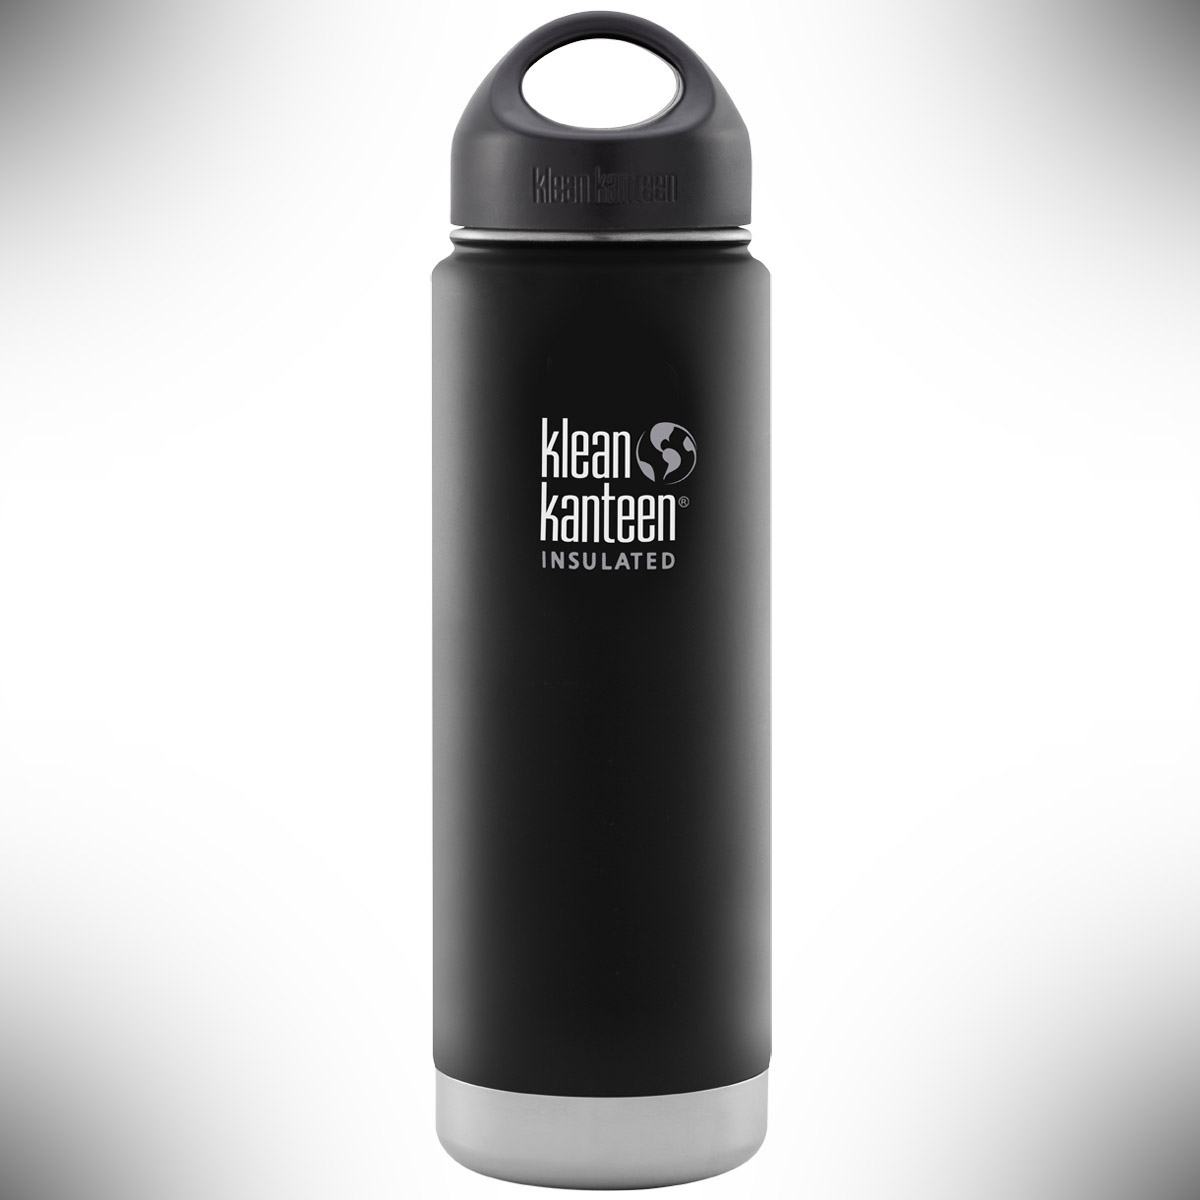 Klean Kanteen Wide Mouth Insulated Bottle – travel mug